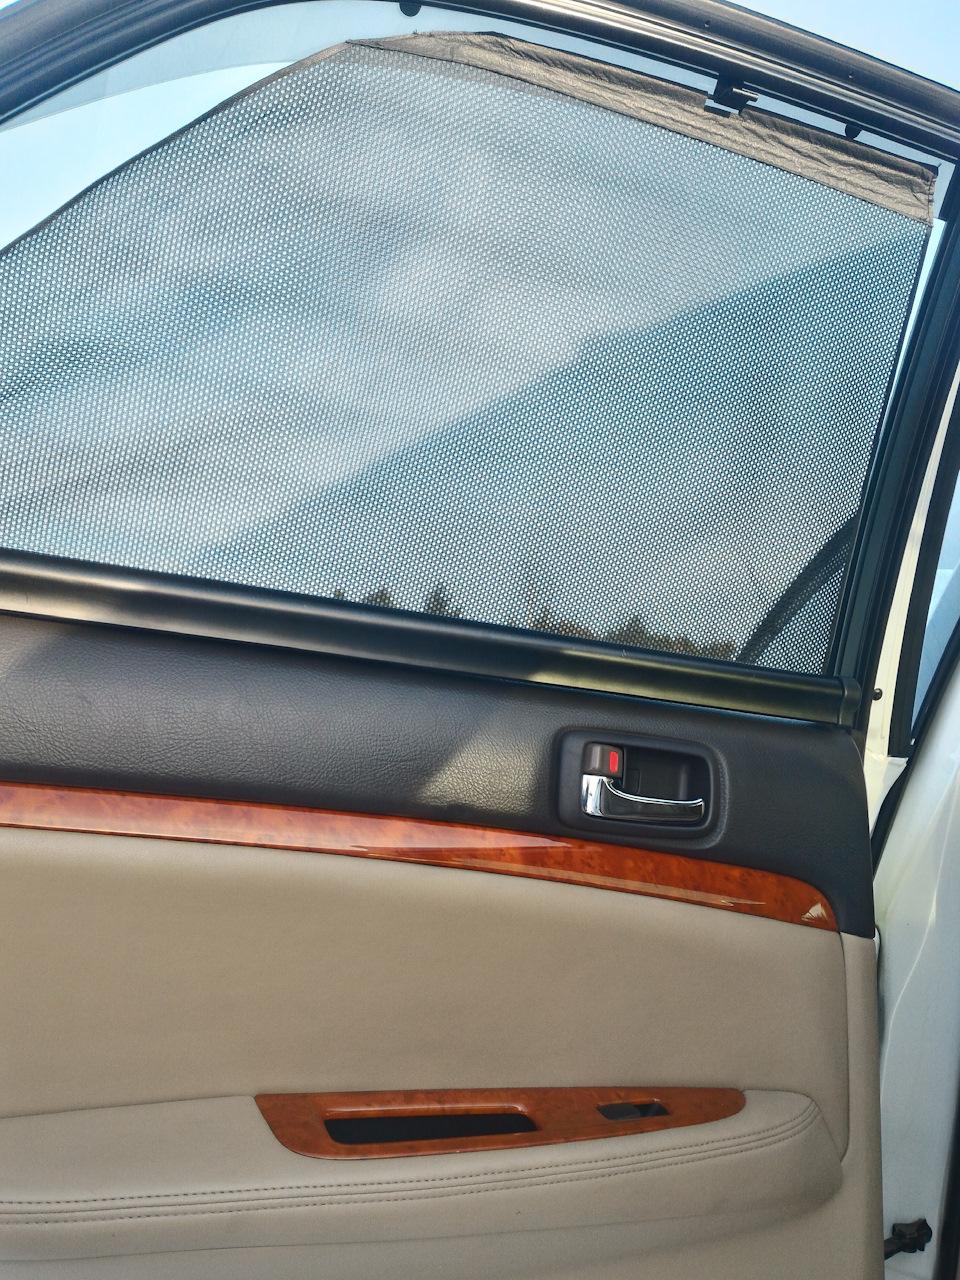 Шторки на стеклах автомобиля своими руками 566